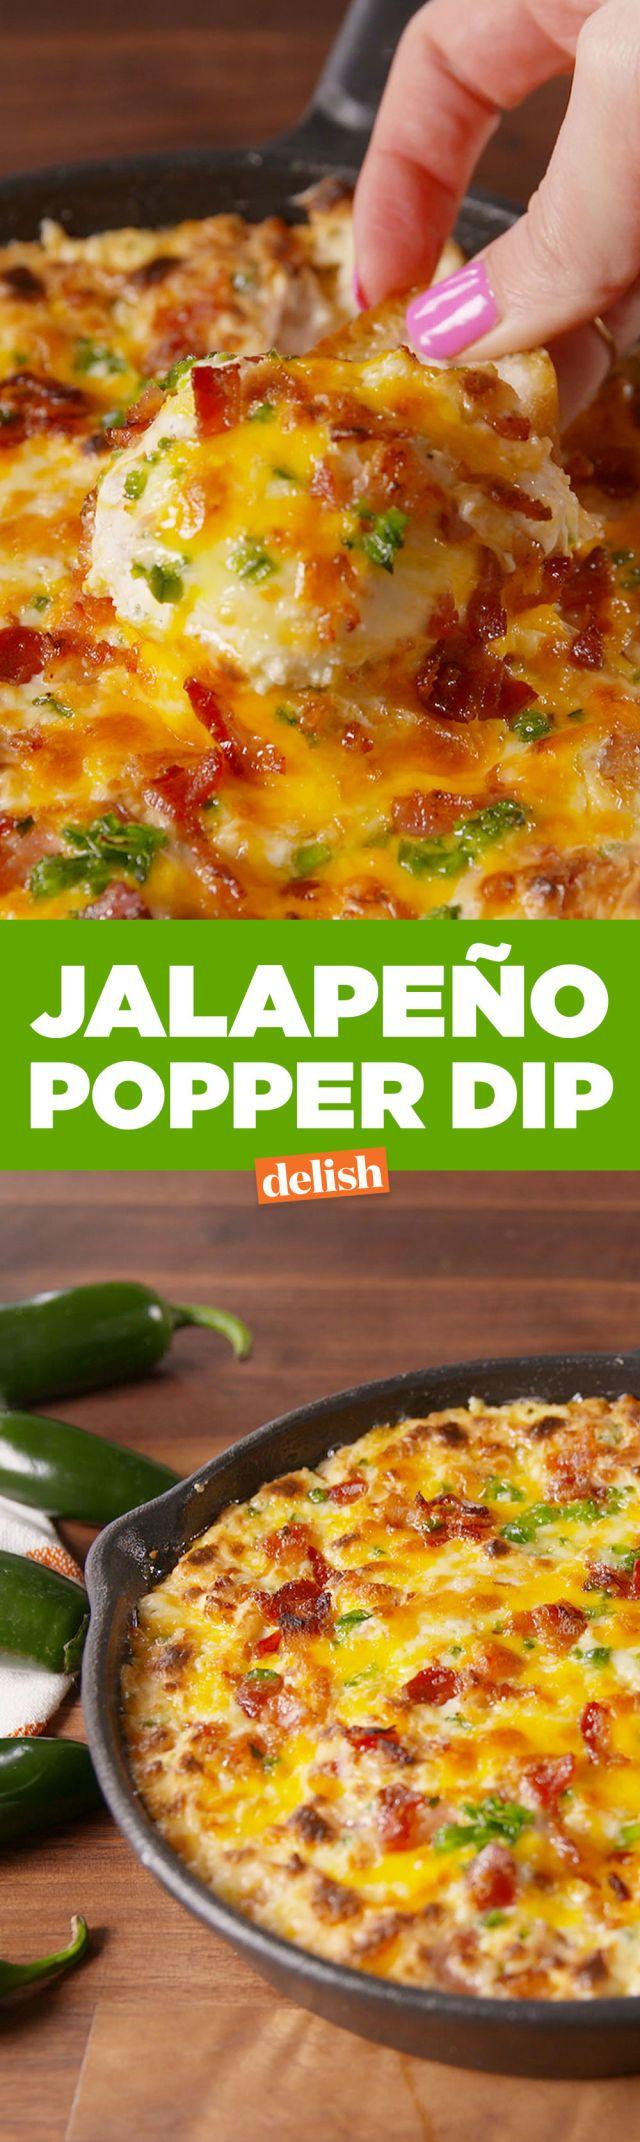 Best Jalapeño Popper Dip - How to Make Jalapeño Popper Dip